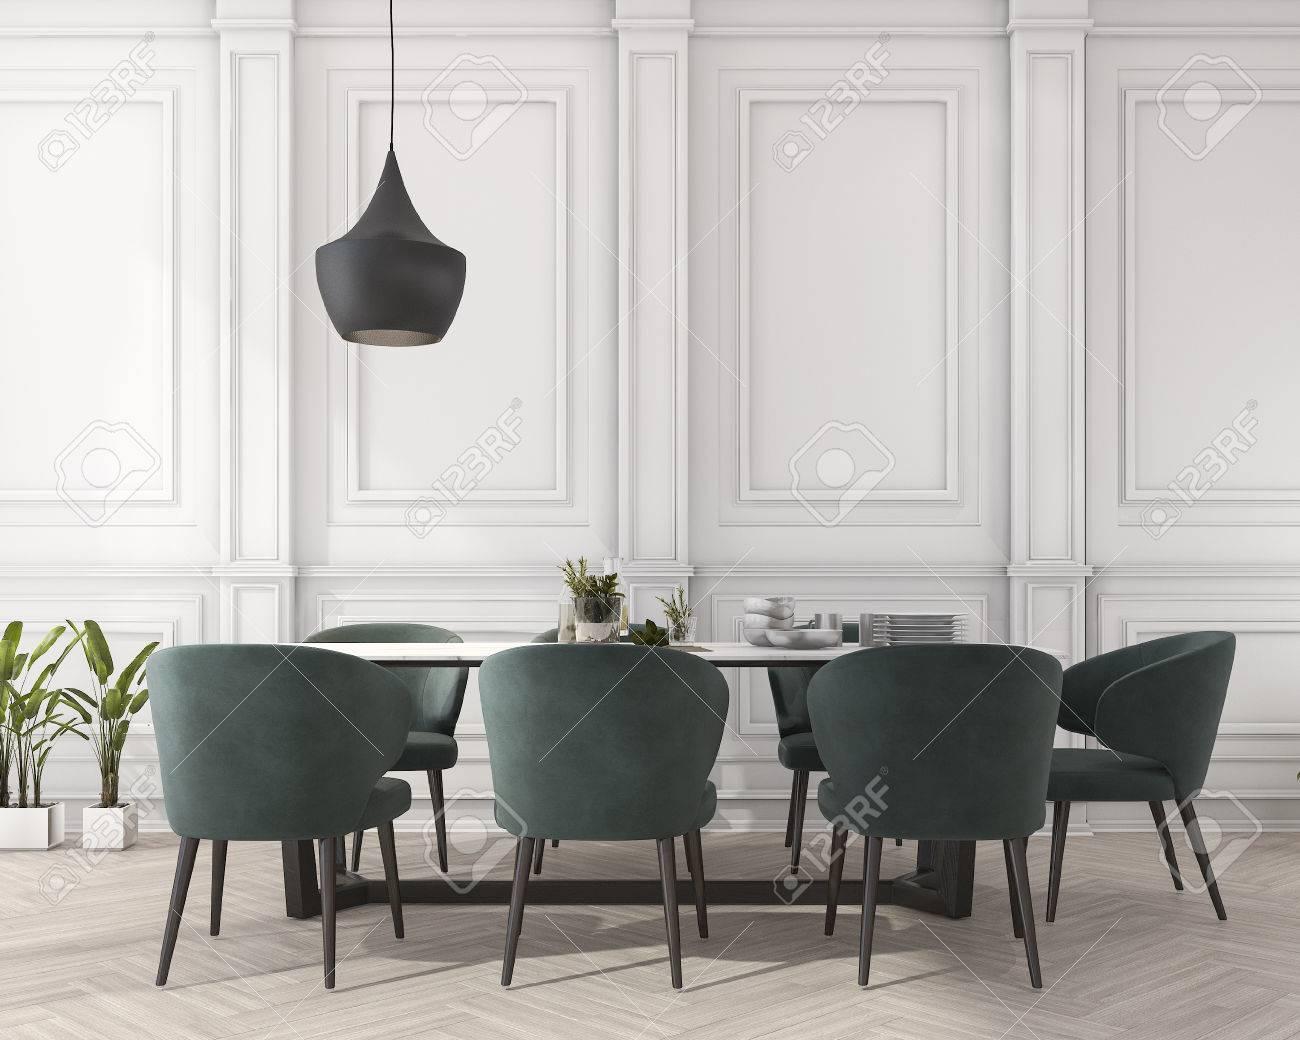 Tavoli Da Pranzo Classici : D rendering tavolo da pranzo classico in sala da pranzo bianco